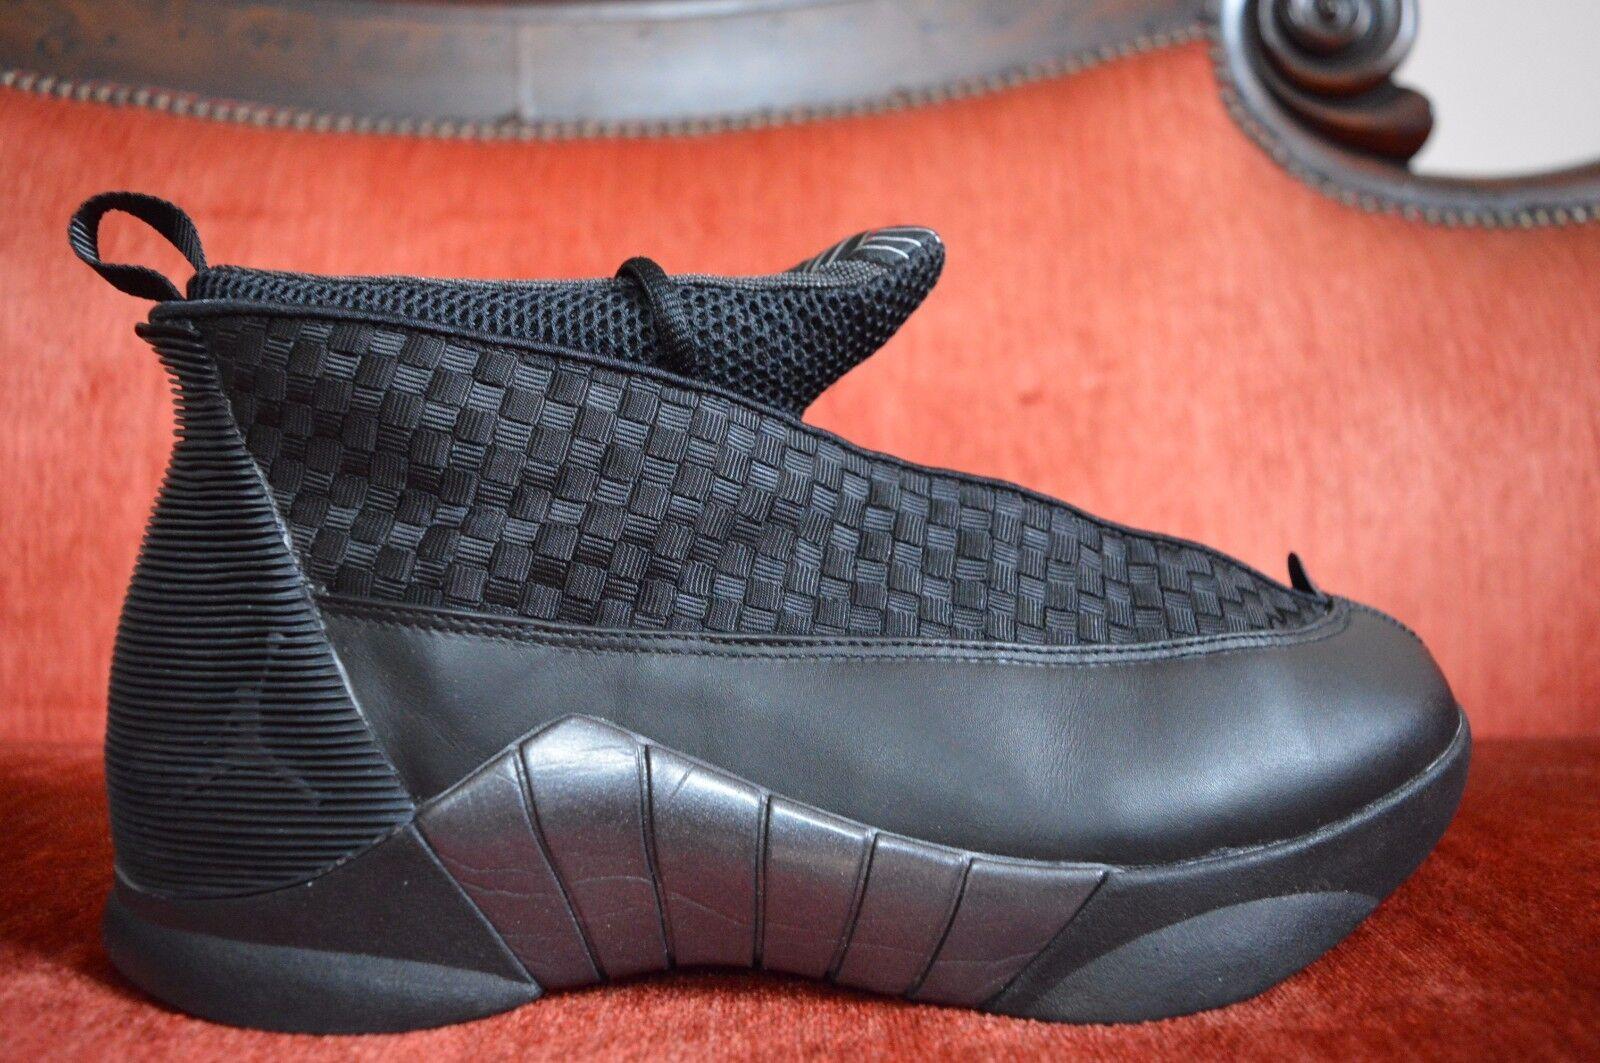 WORN ONCE 2018 Nike Air Jordan XV Comfortable best-selling model of the brand